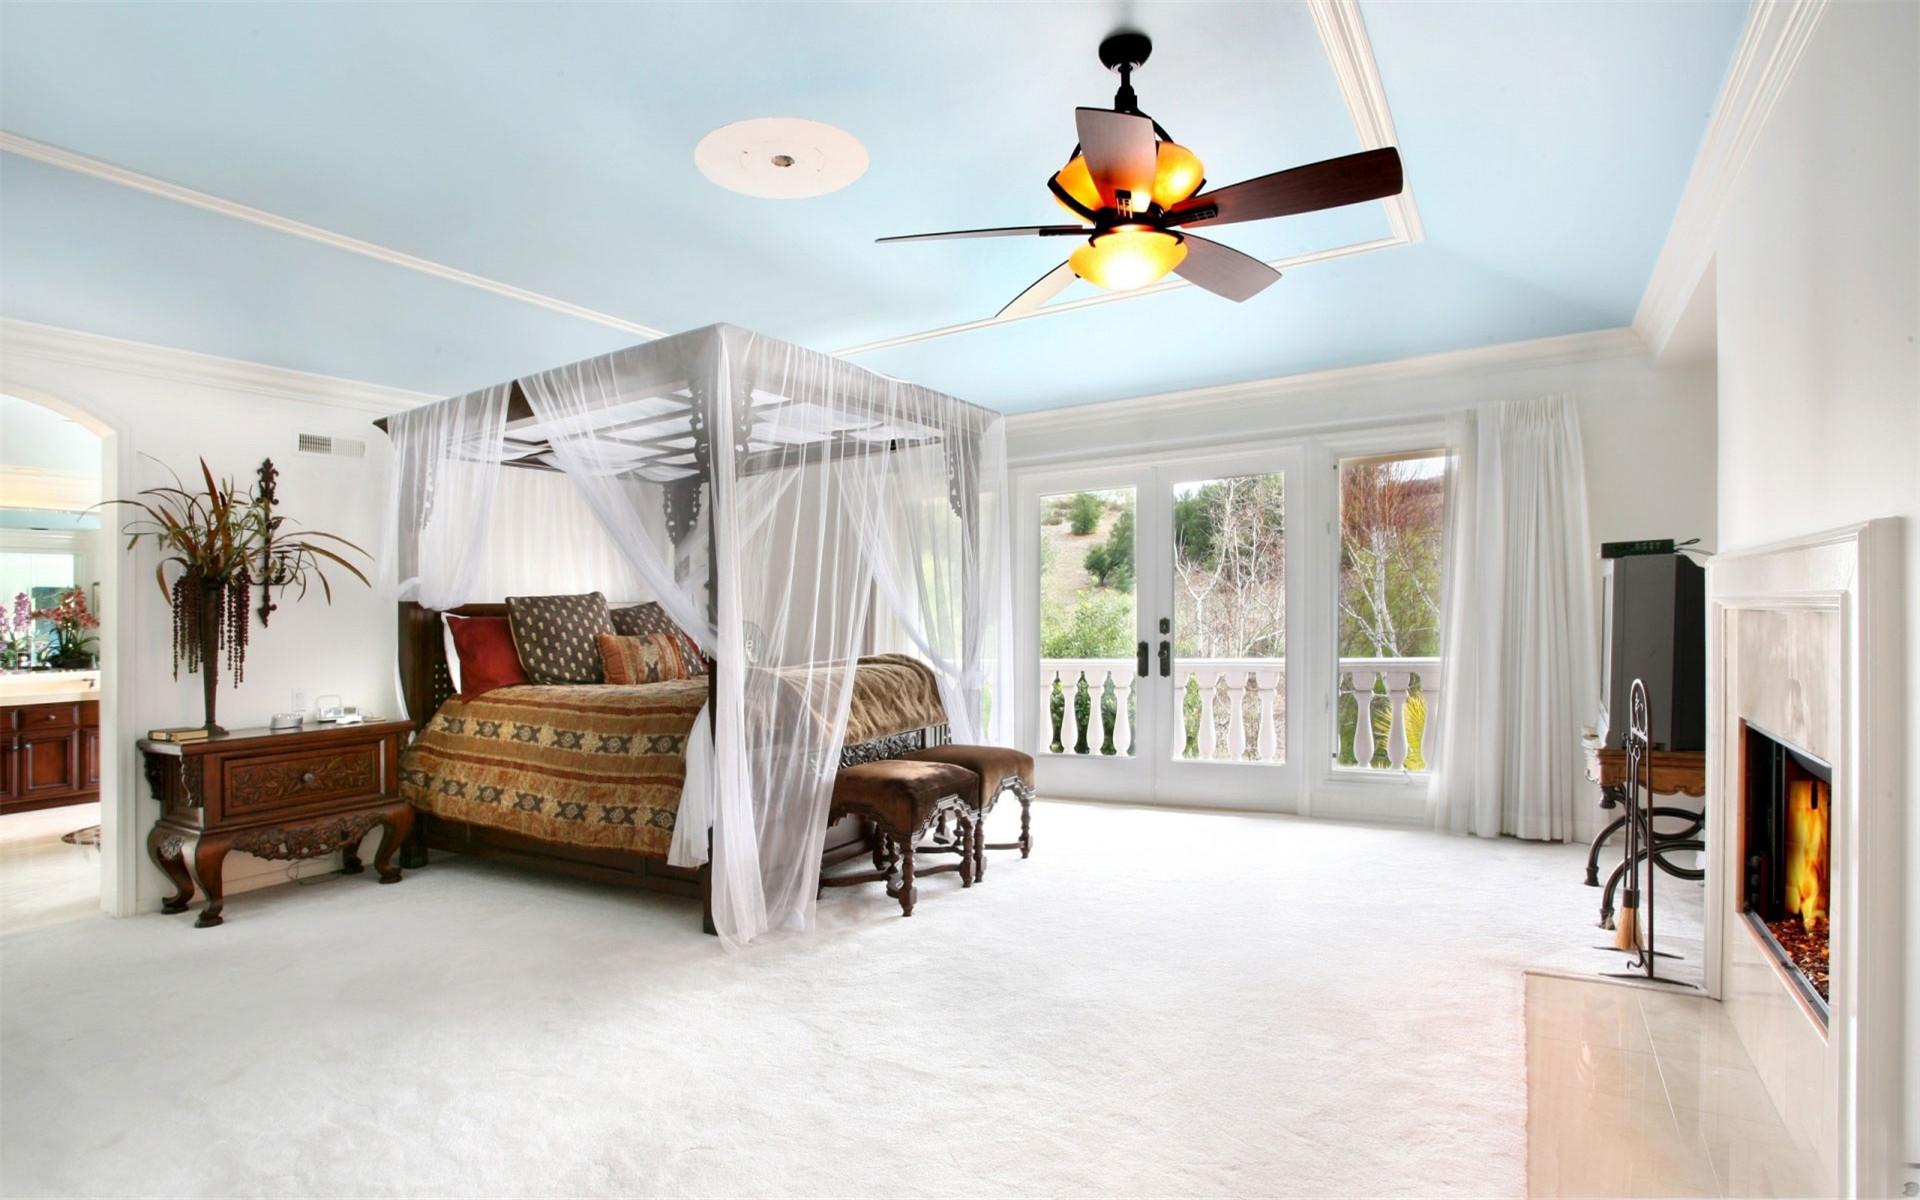 【v粉壁纸】家居舒适室内设计高清壁纸